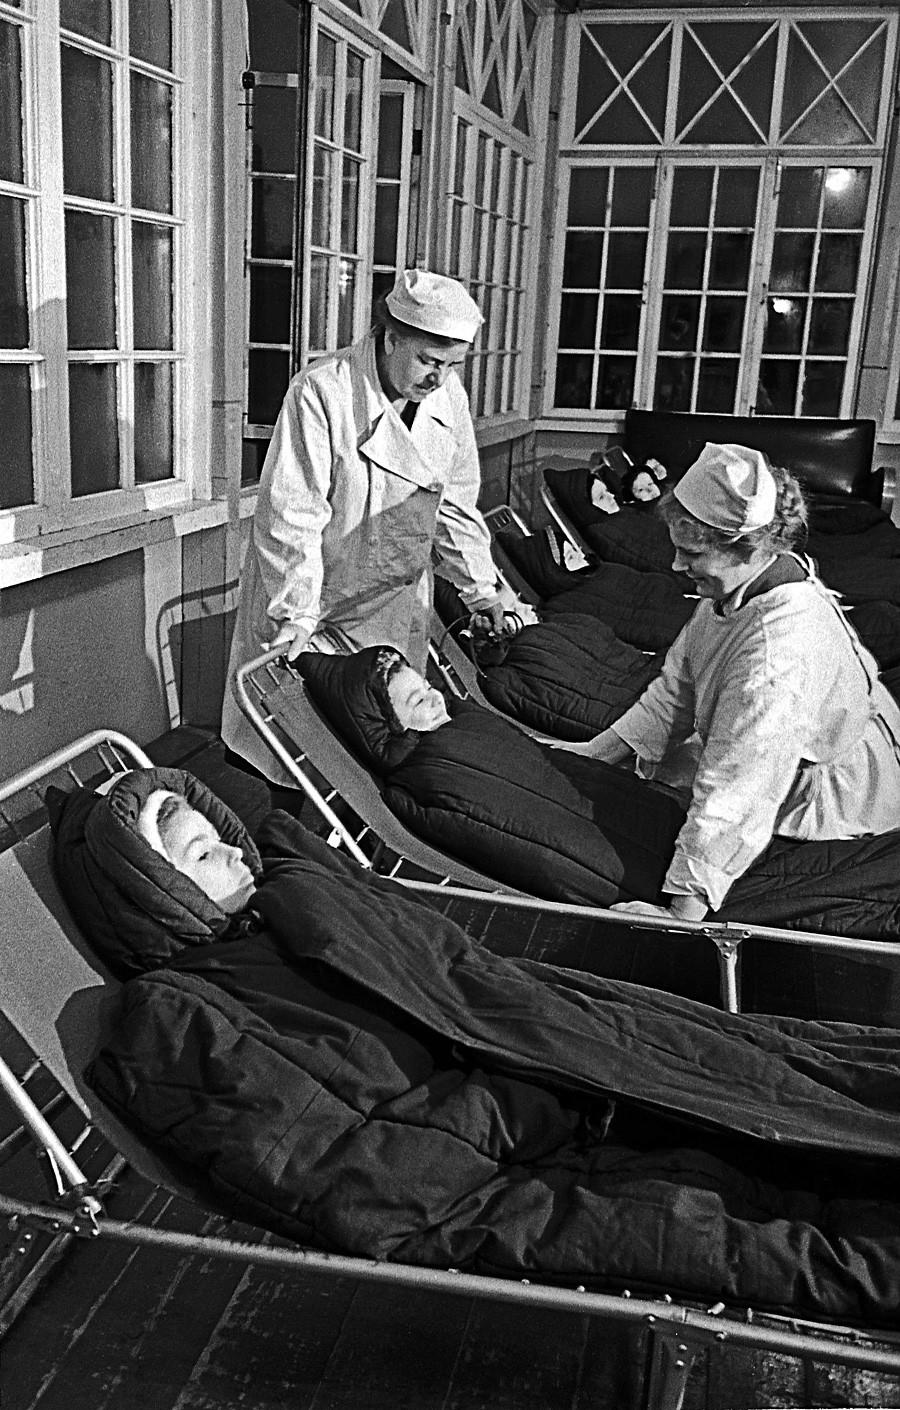 Anak-anak di sanatorium di Tanah Genting Karelia, Uni Soviet, 1959